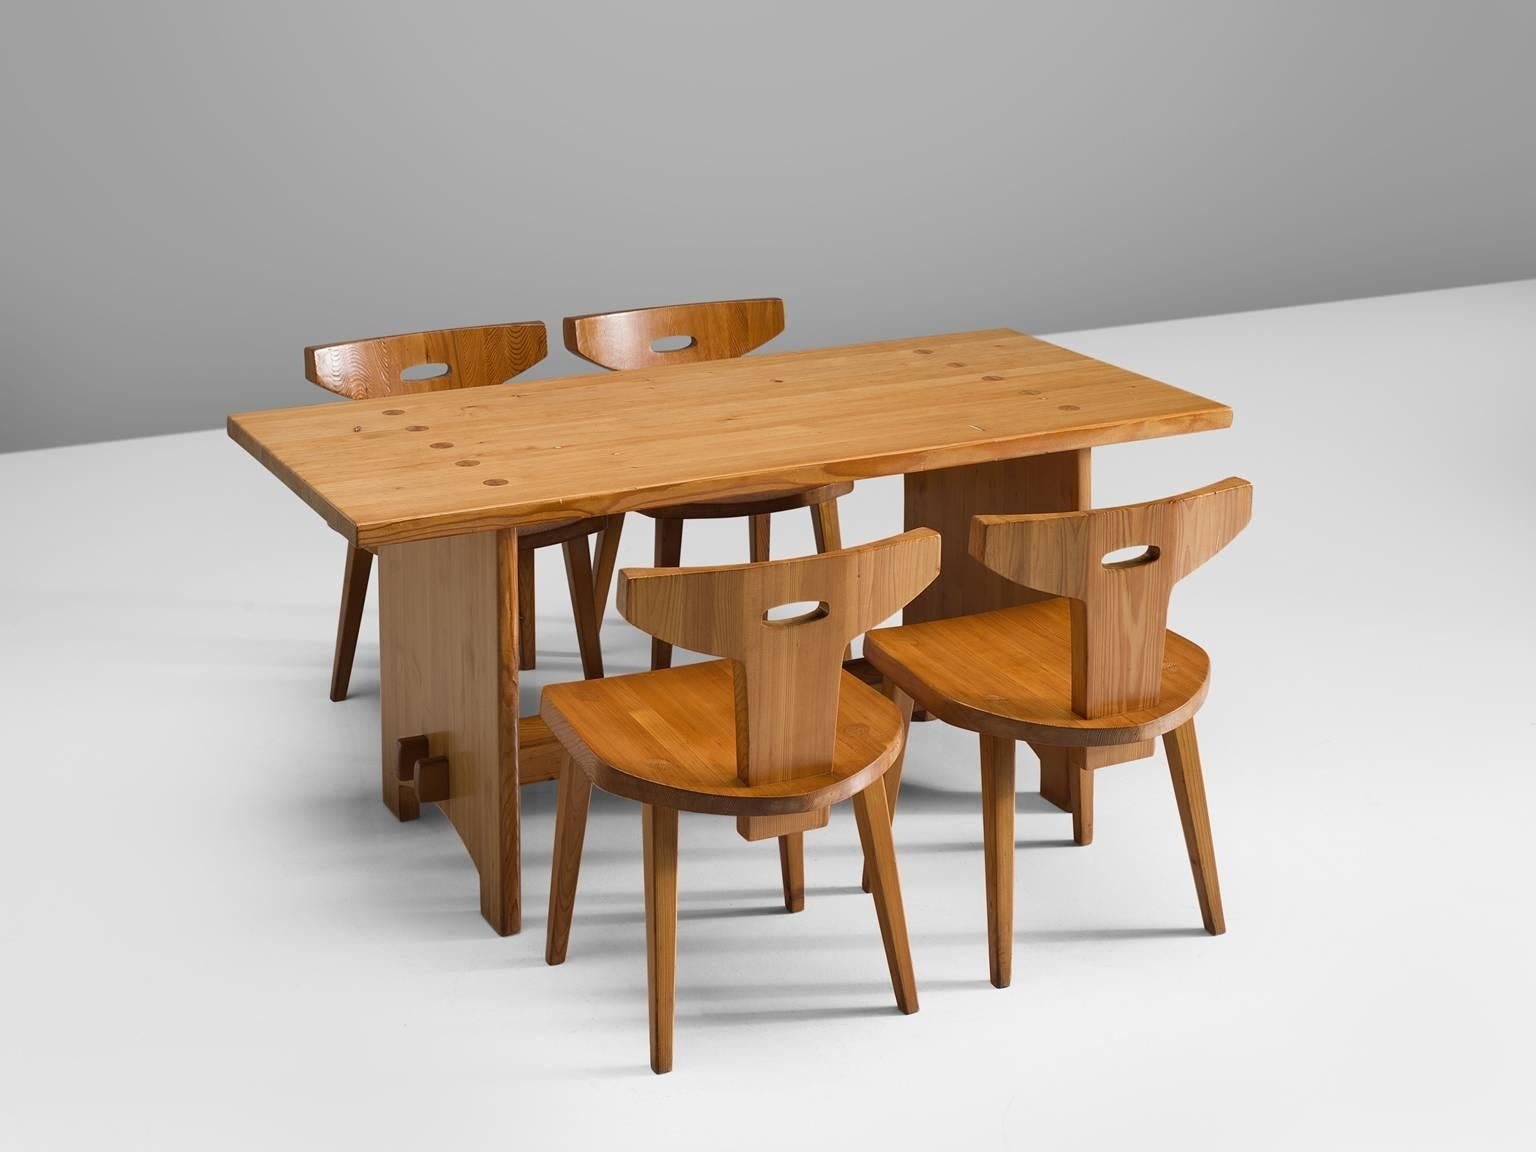 Jacob Kielland Brandt, Dining Set, Solid Pine, Denmark, 1960s. This